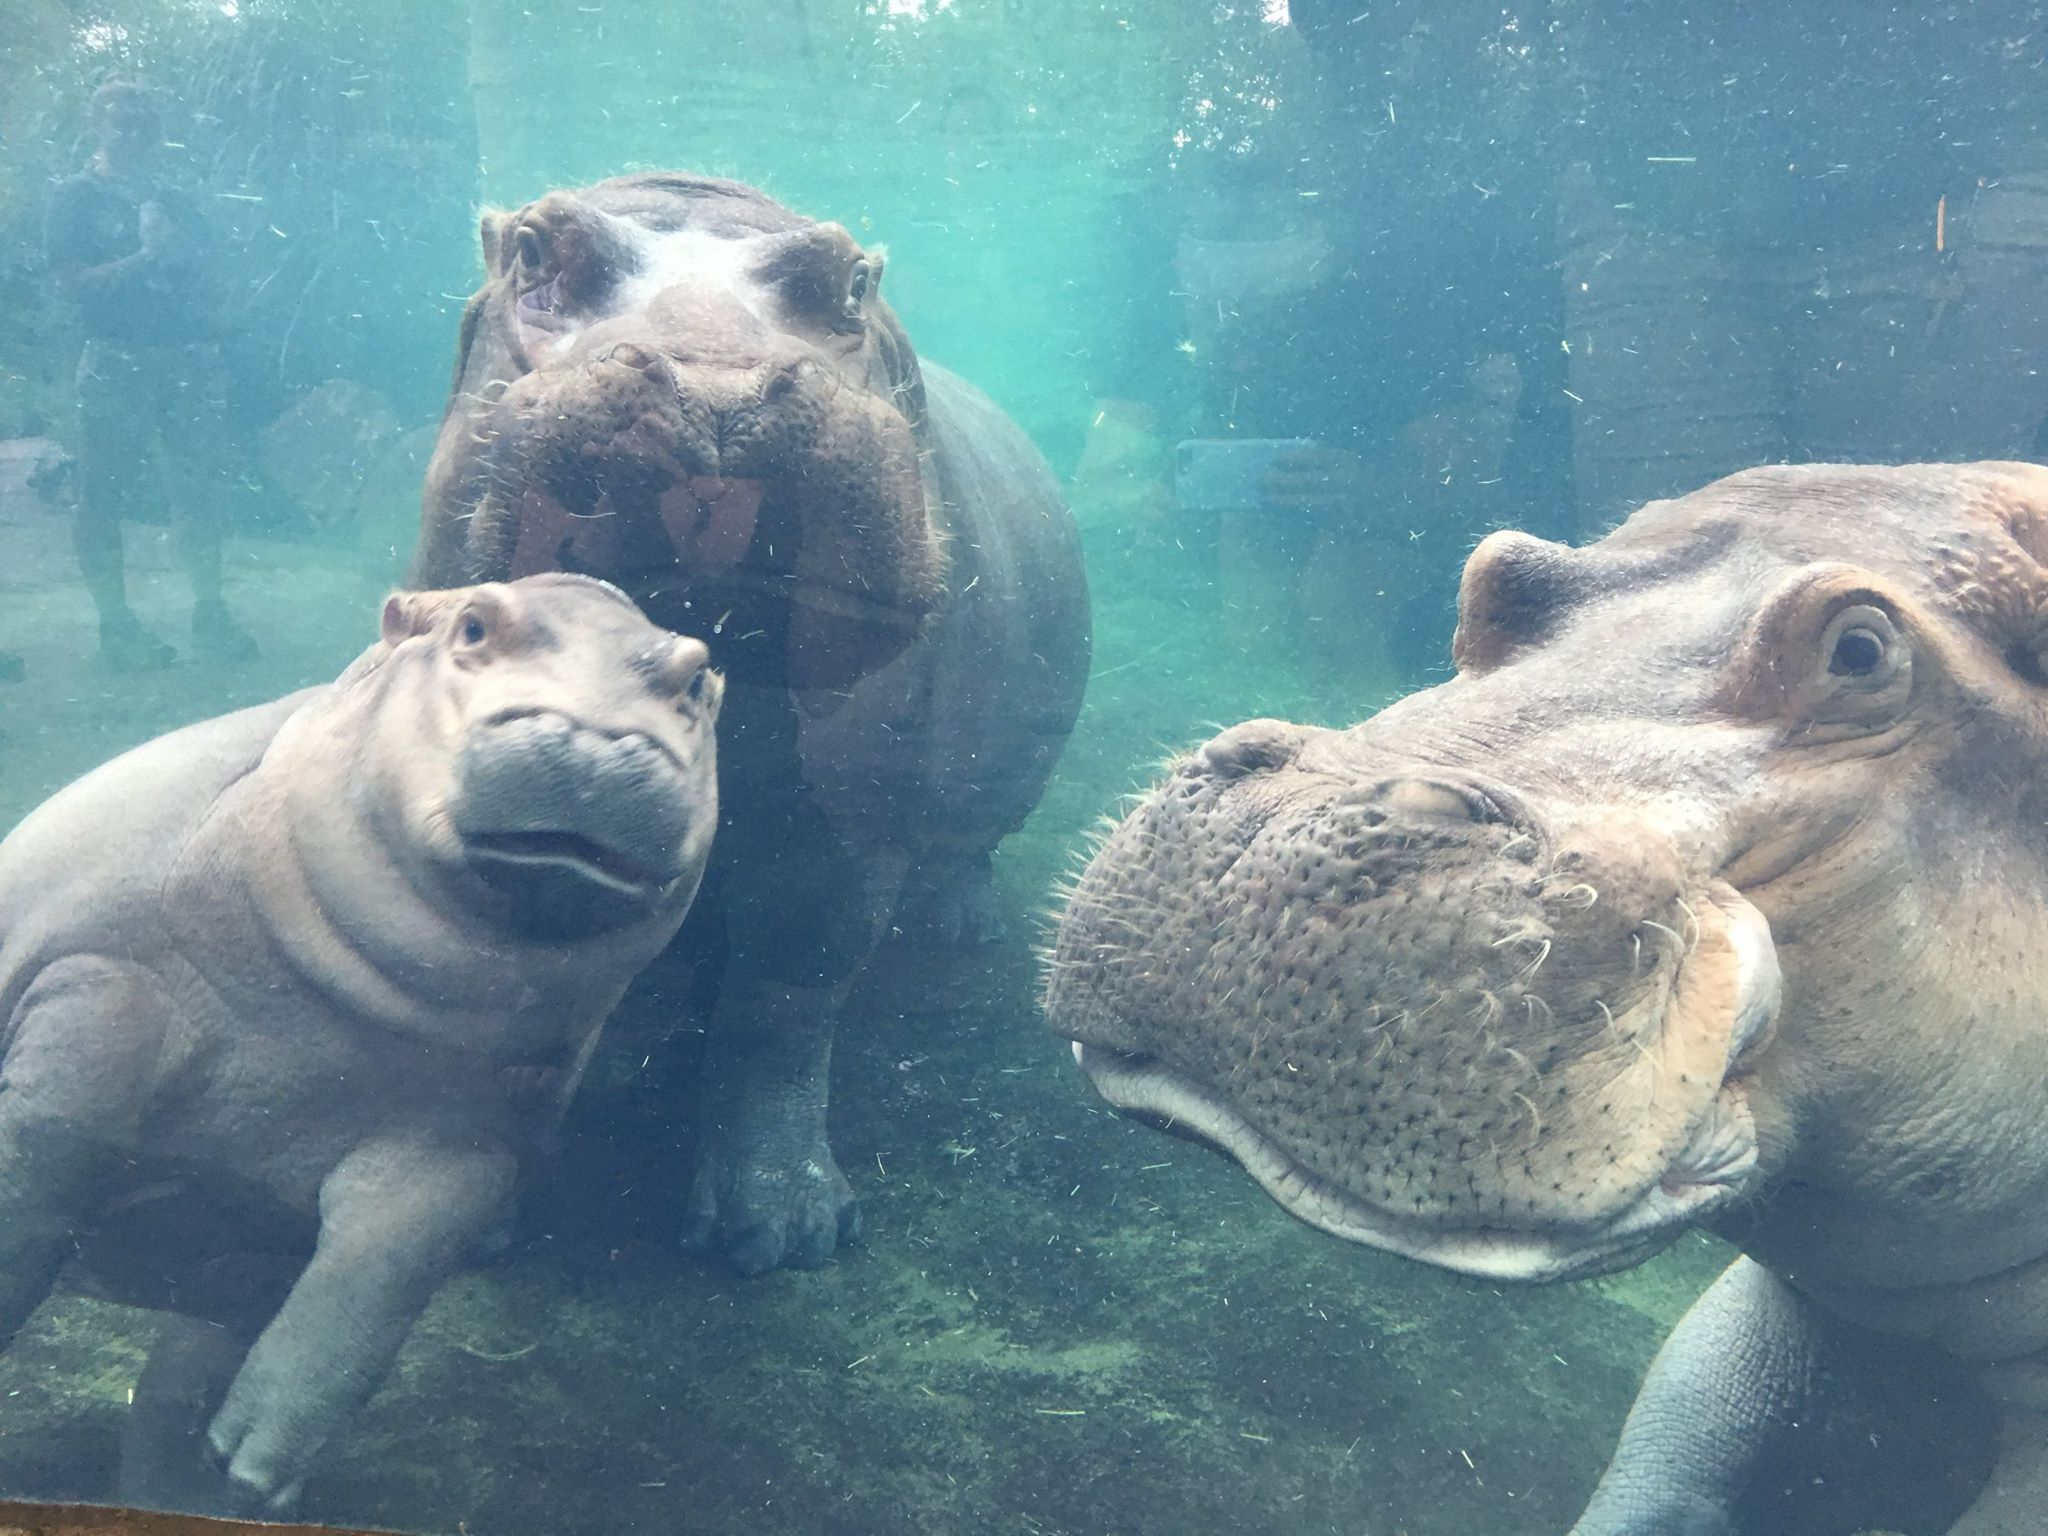 Long Awaited Hippo Family Reunion At The Cincinnati Zoo